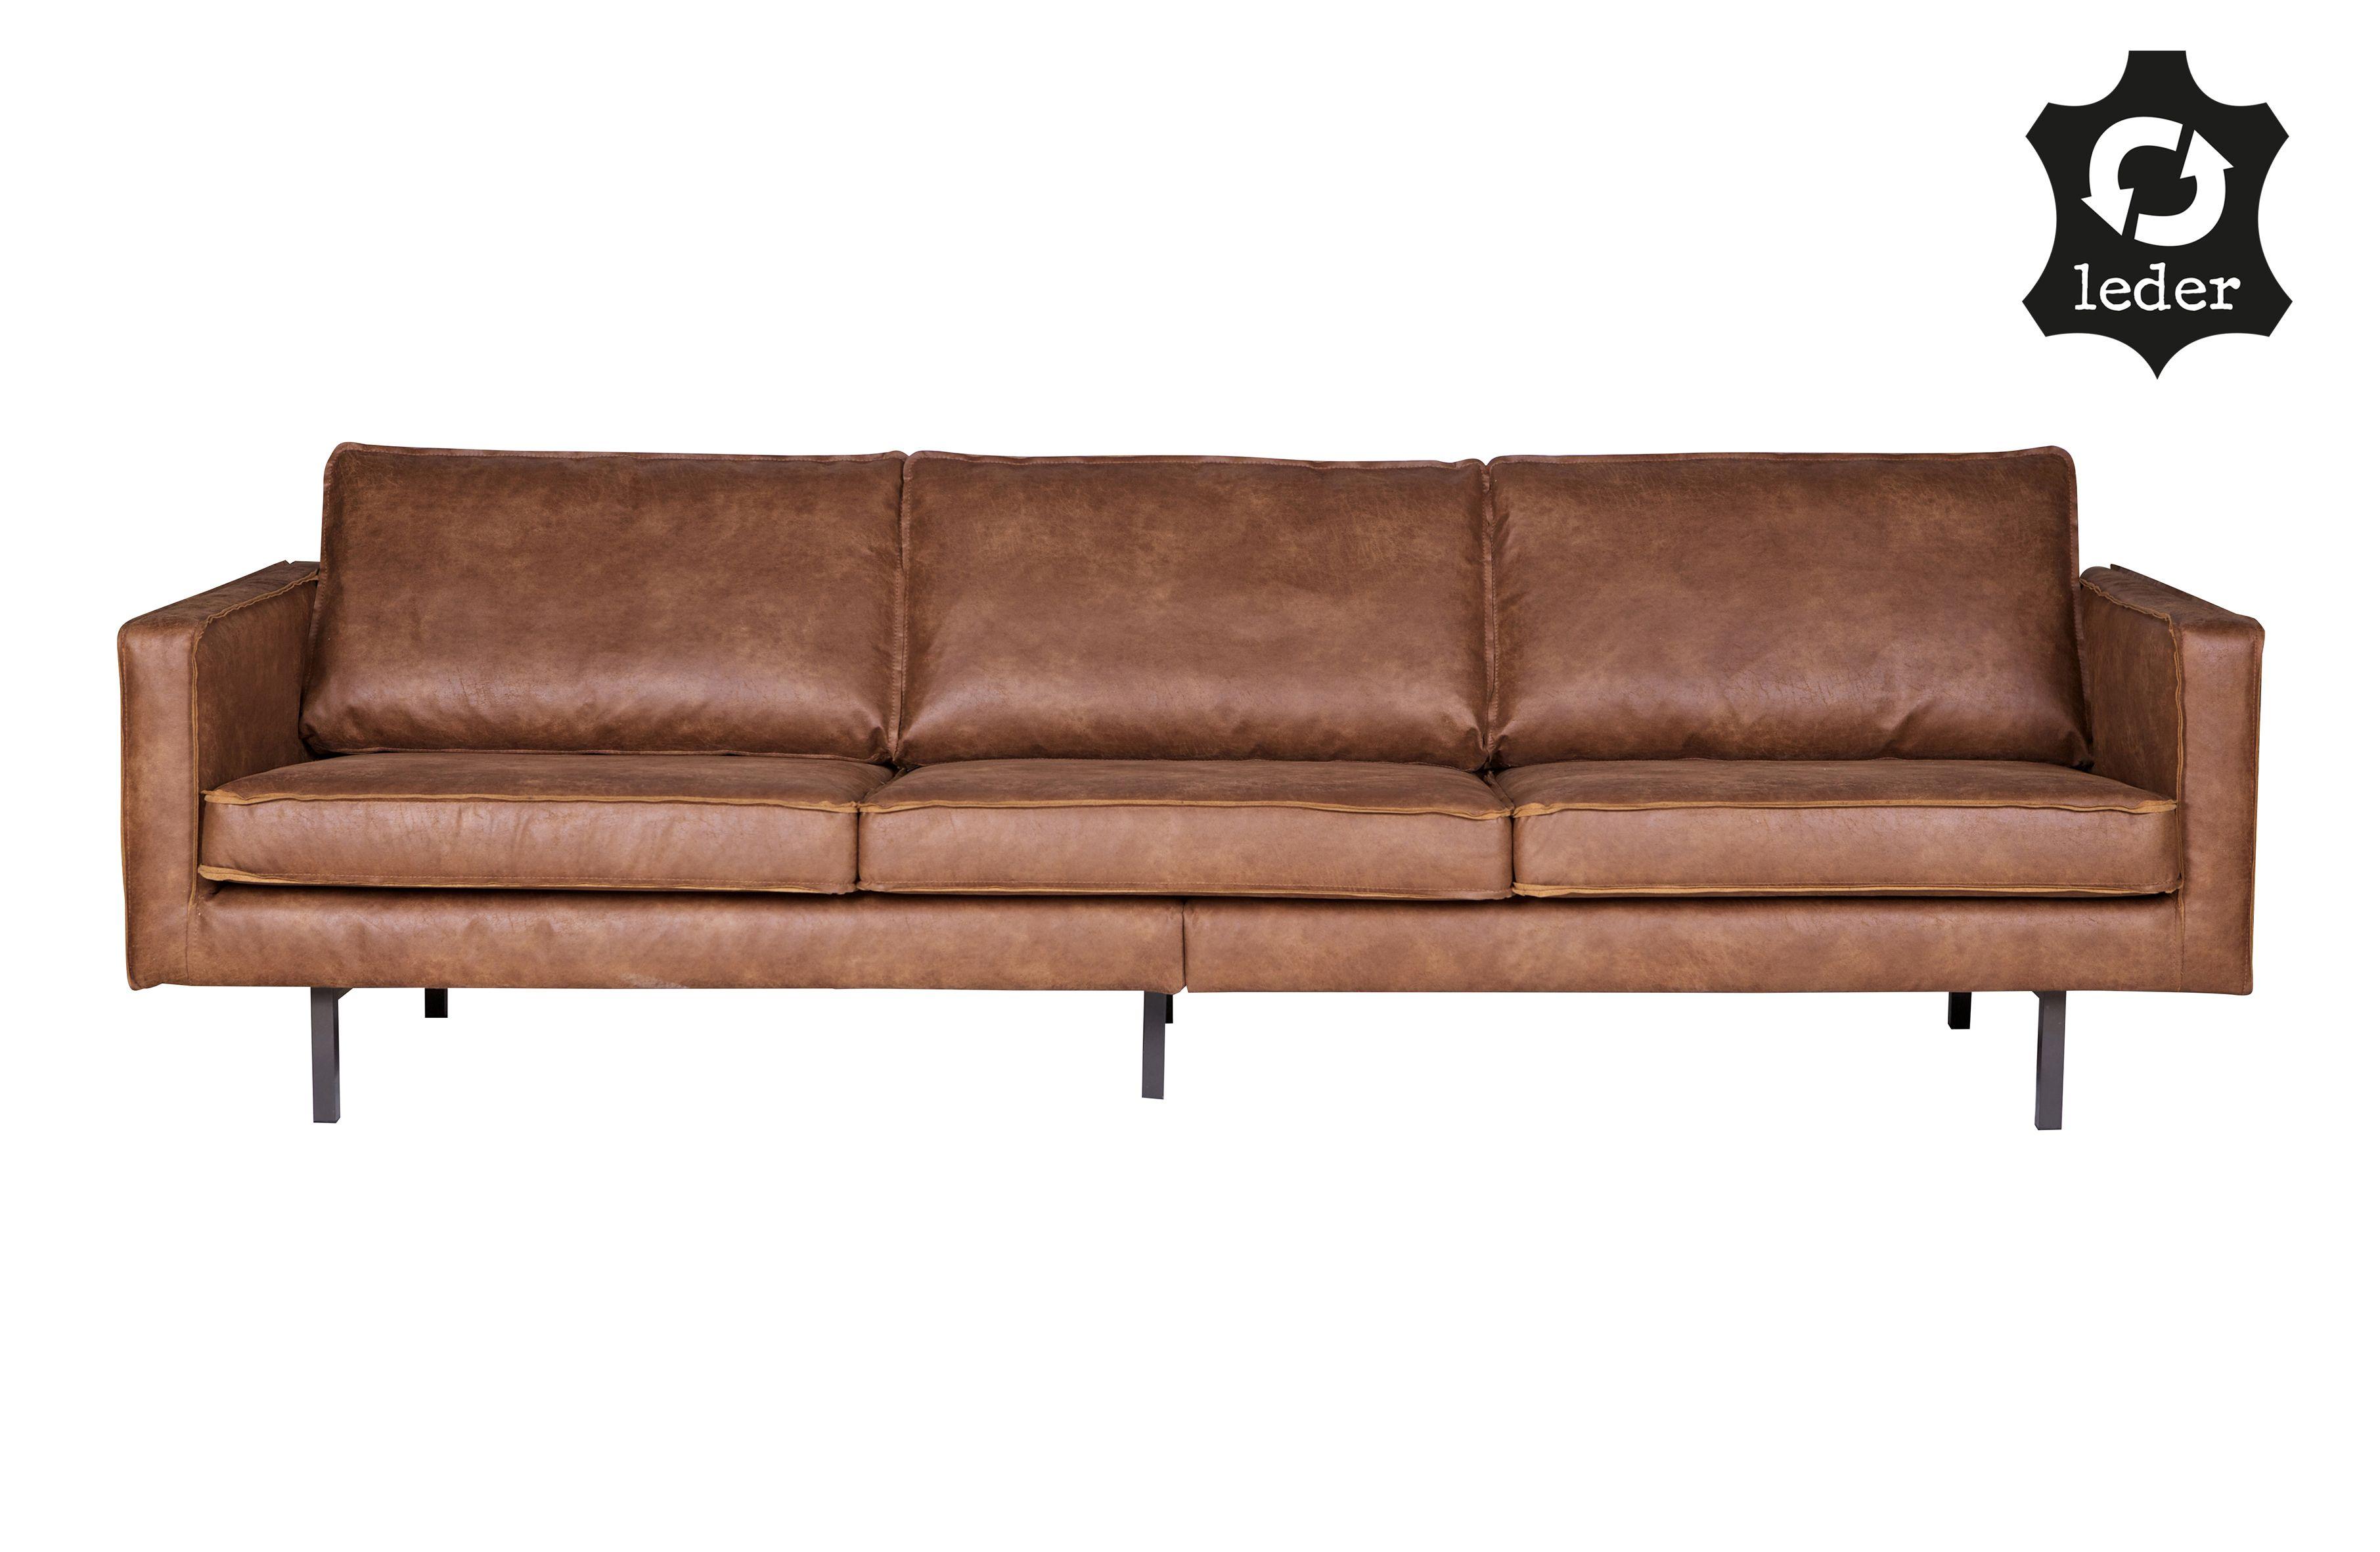 Rodeo sofa 3 seater cognac | Sofas | Wohnzimmer | BEPUREHOME